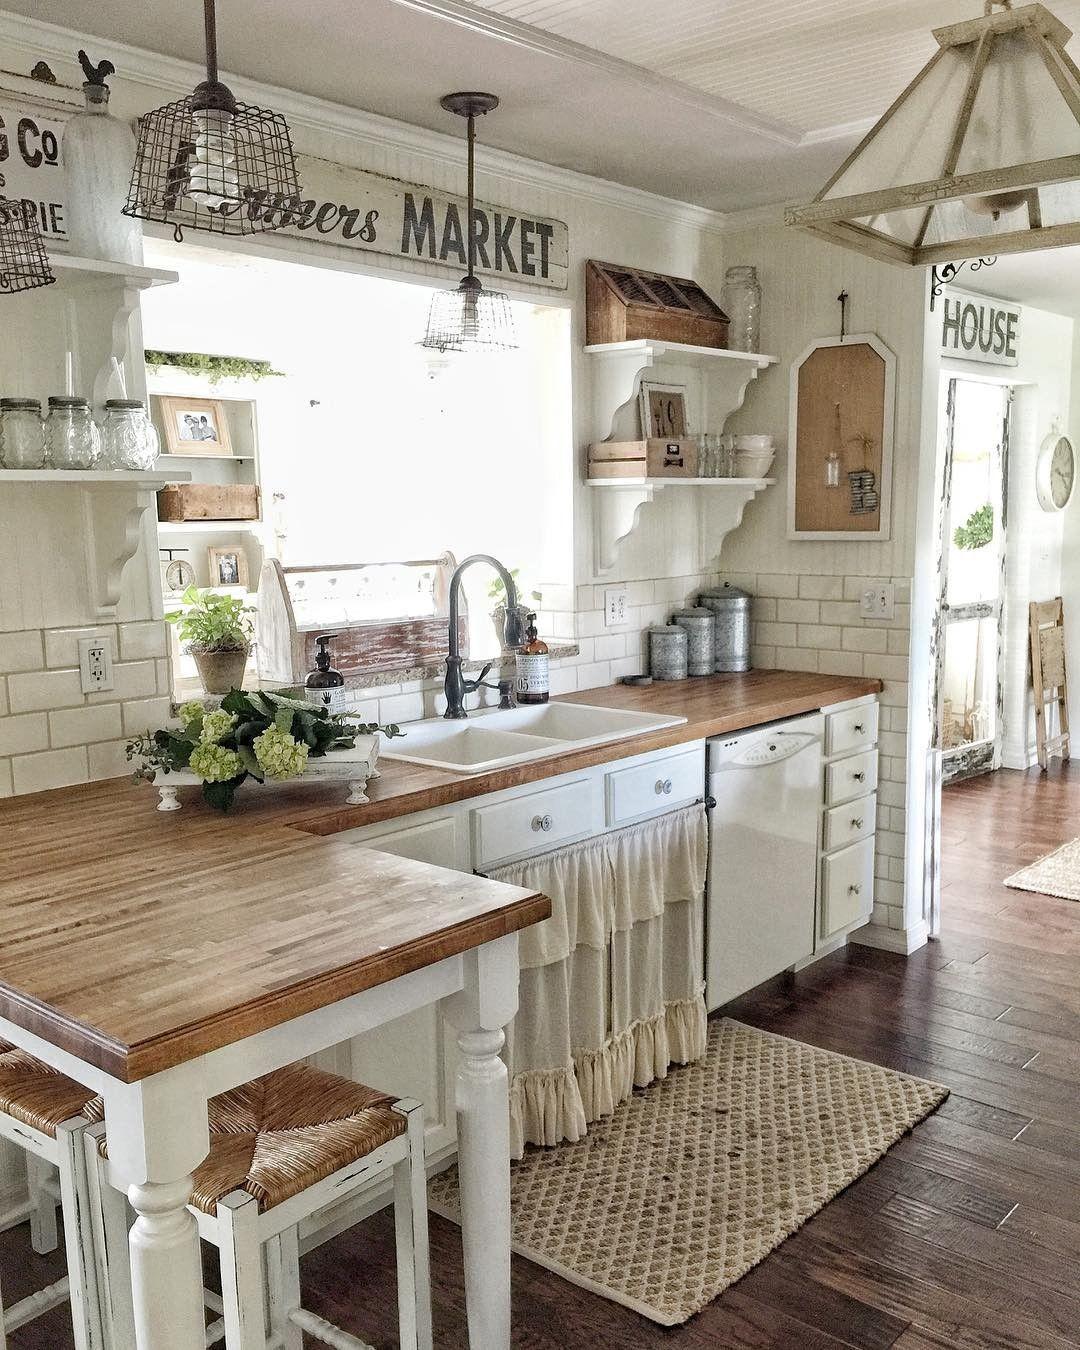 20 farmhouse kitchen ideas on a budget for 2018   küche   pinterest